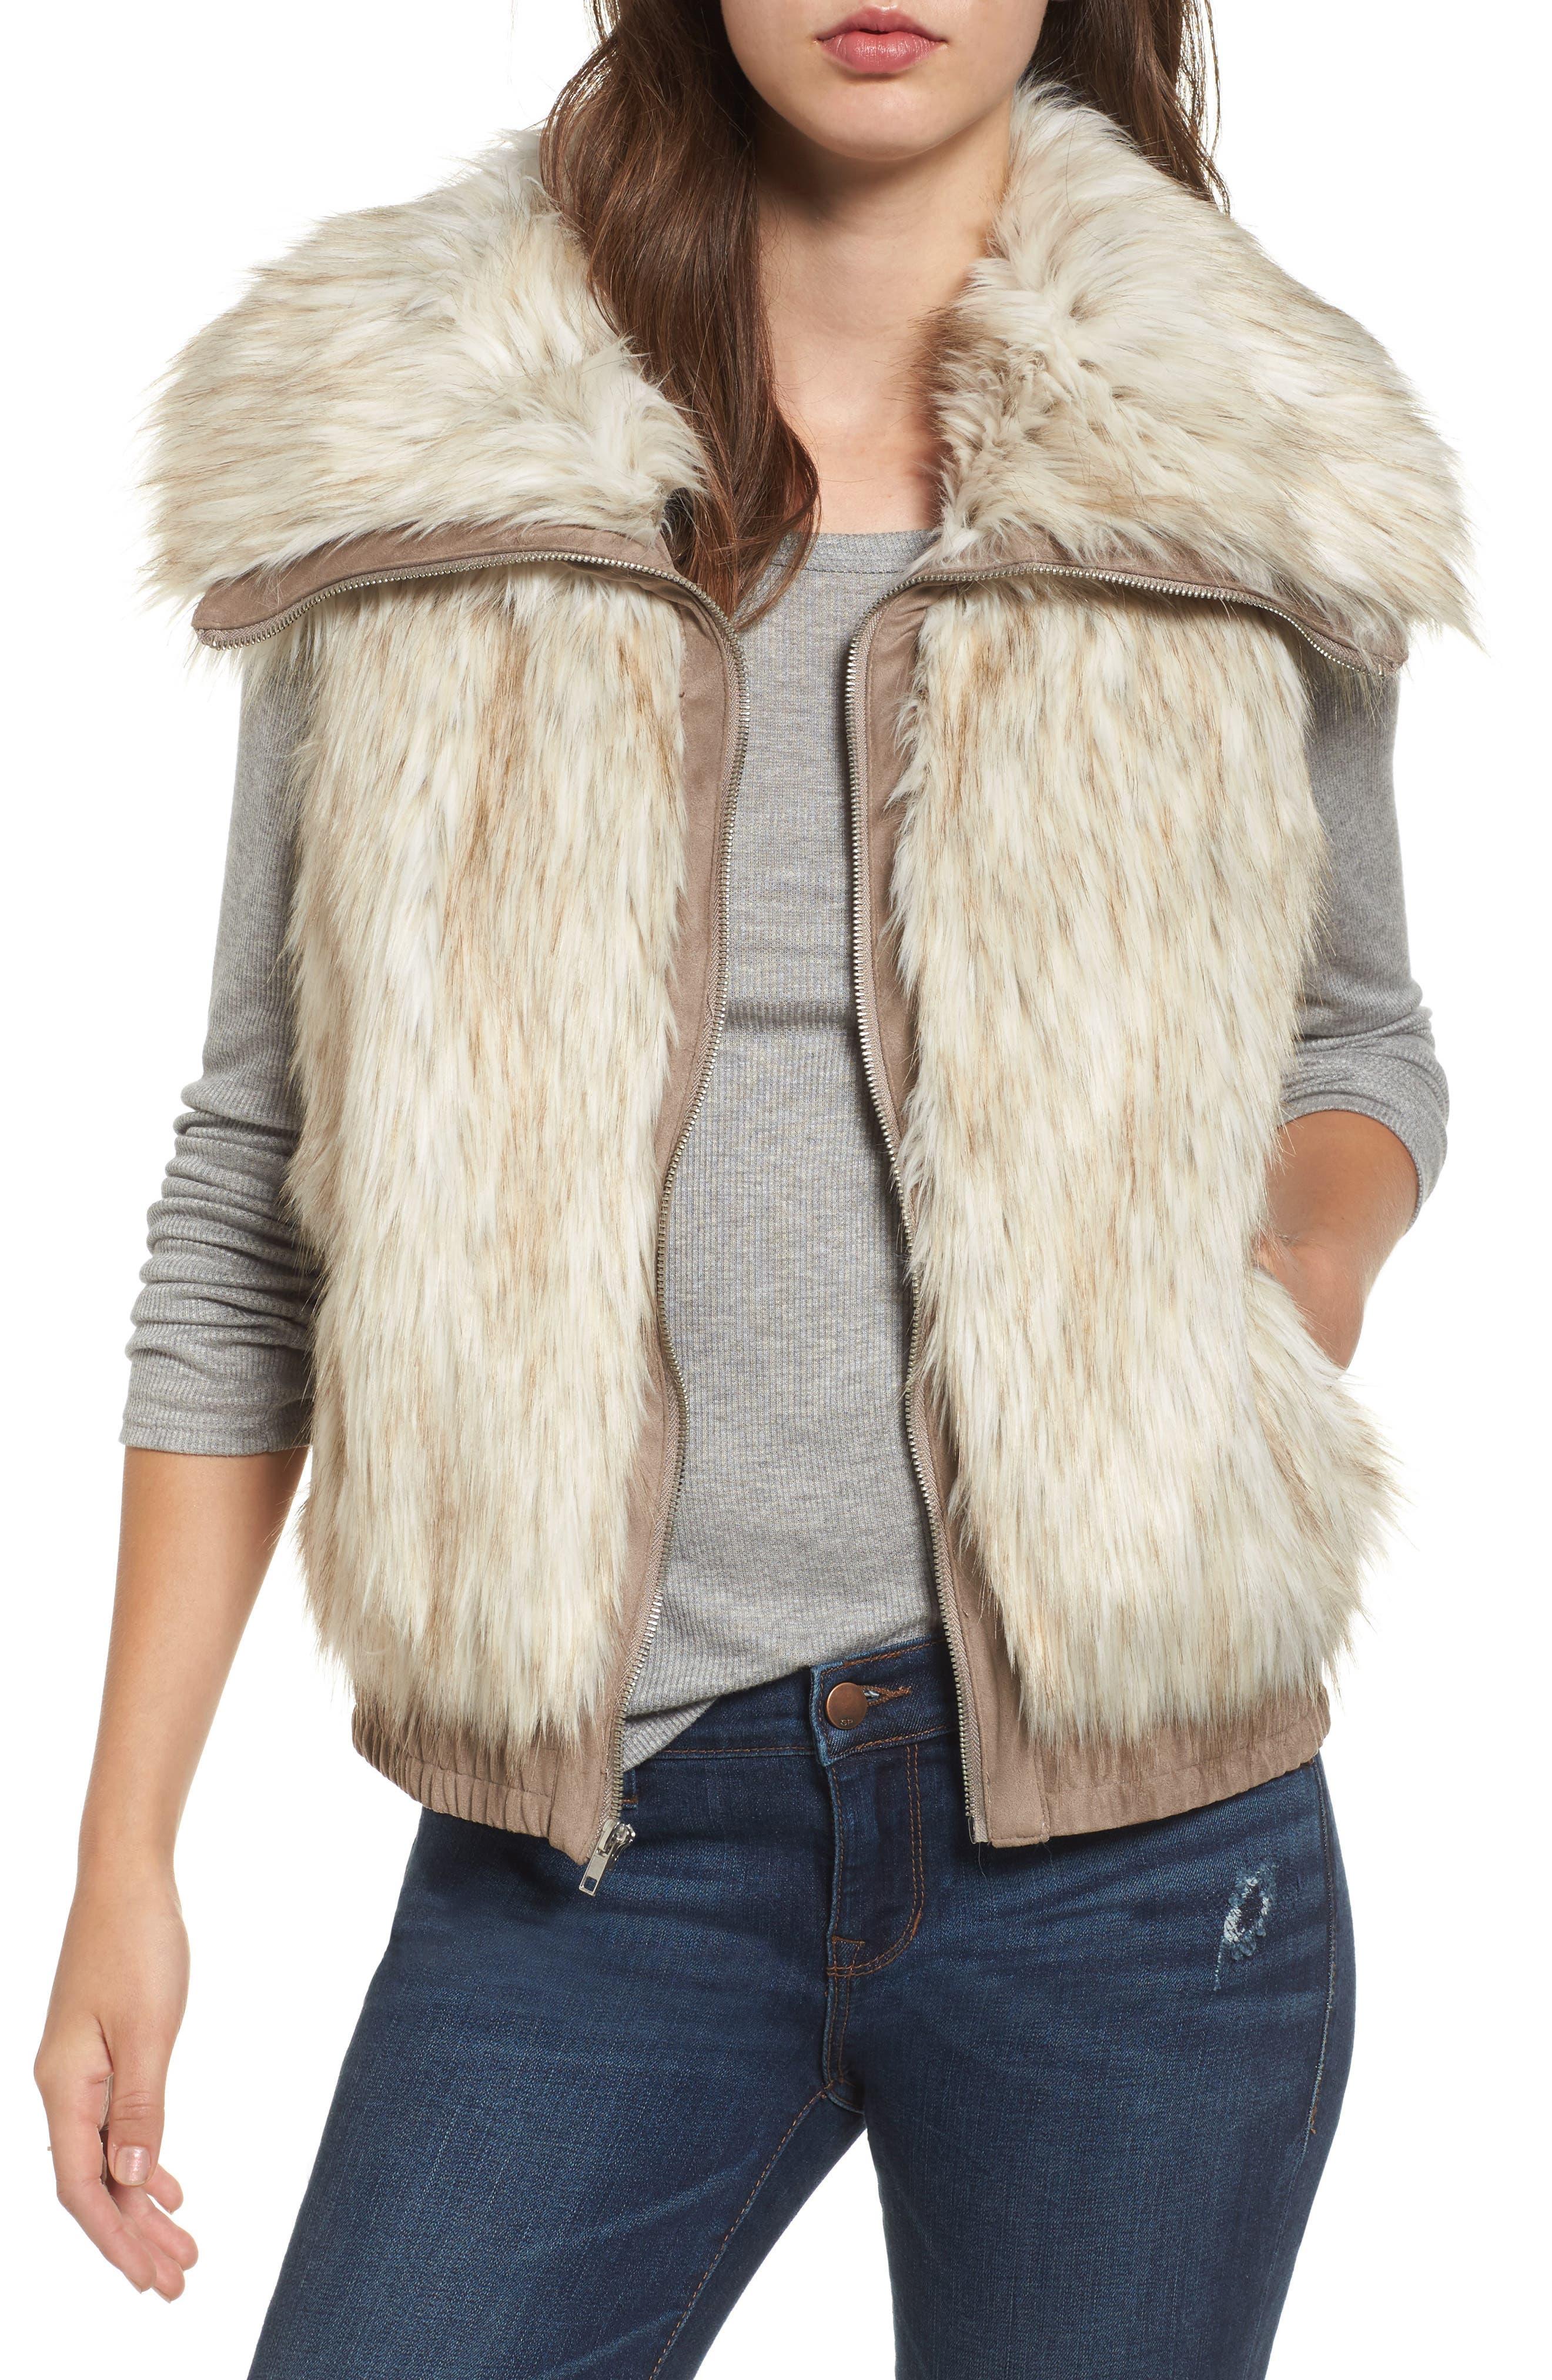 Alternate Image 1 Selected - BB Dakota Collared Faux Fur Vest